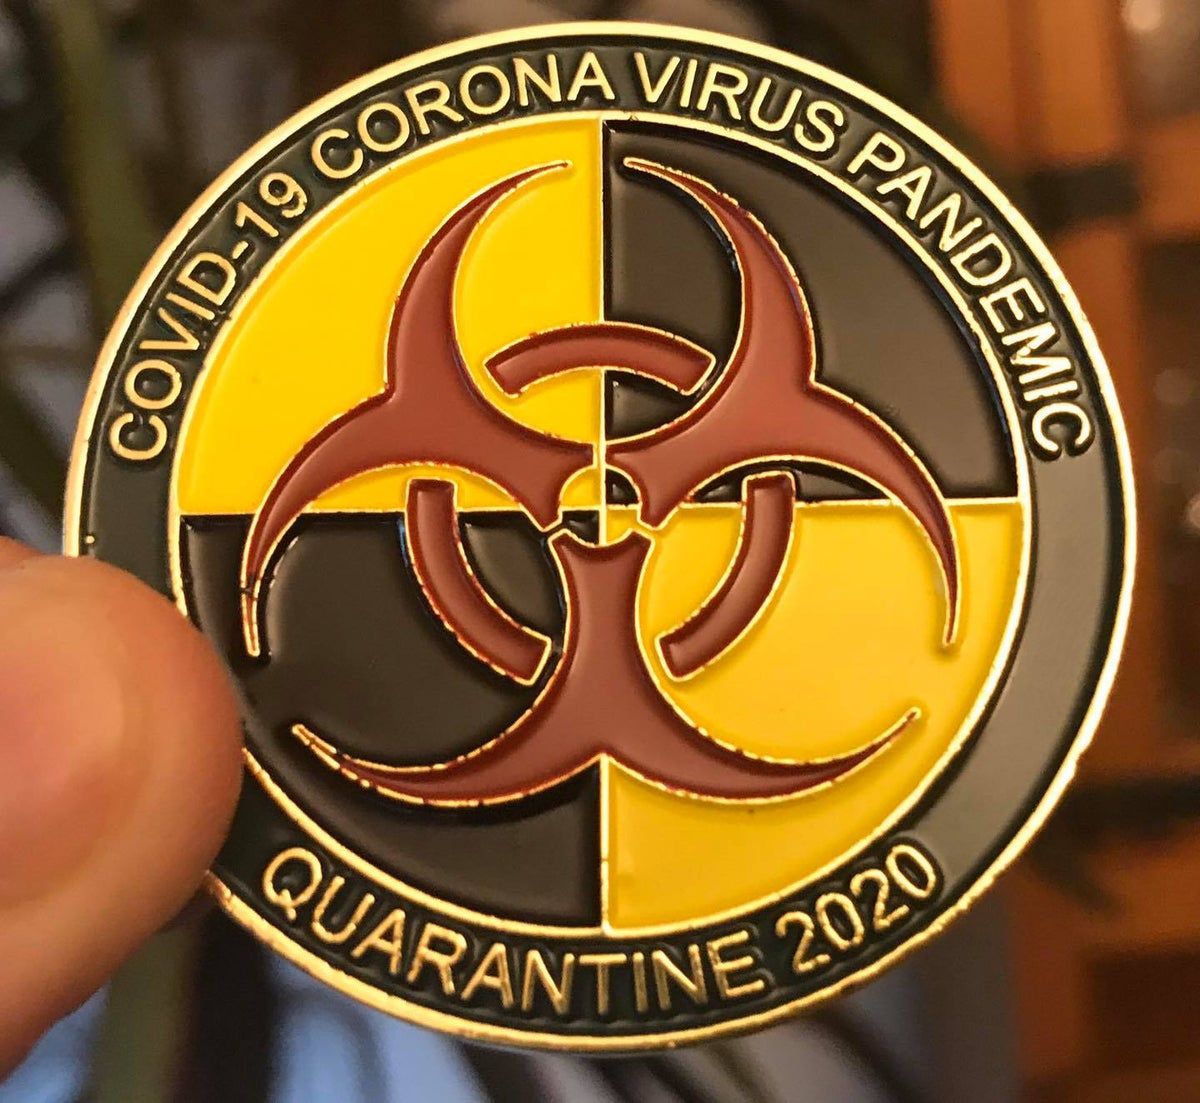 Image of COVID-19 CORONA VIRUS PANDEMIC - QUARANTINE 2020 (ONLY 100 ORDERED)